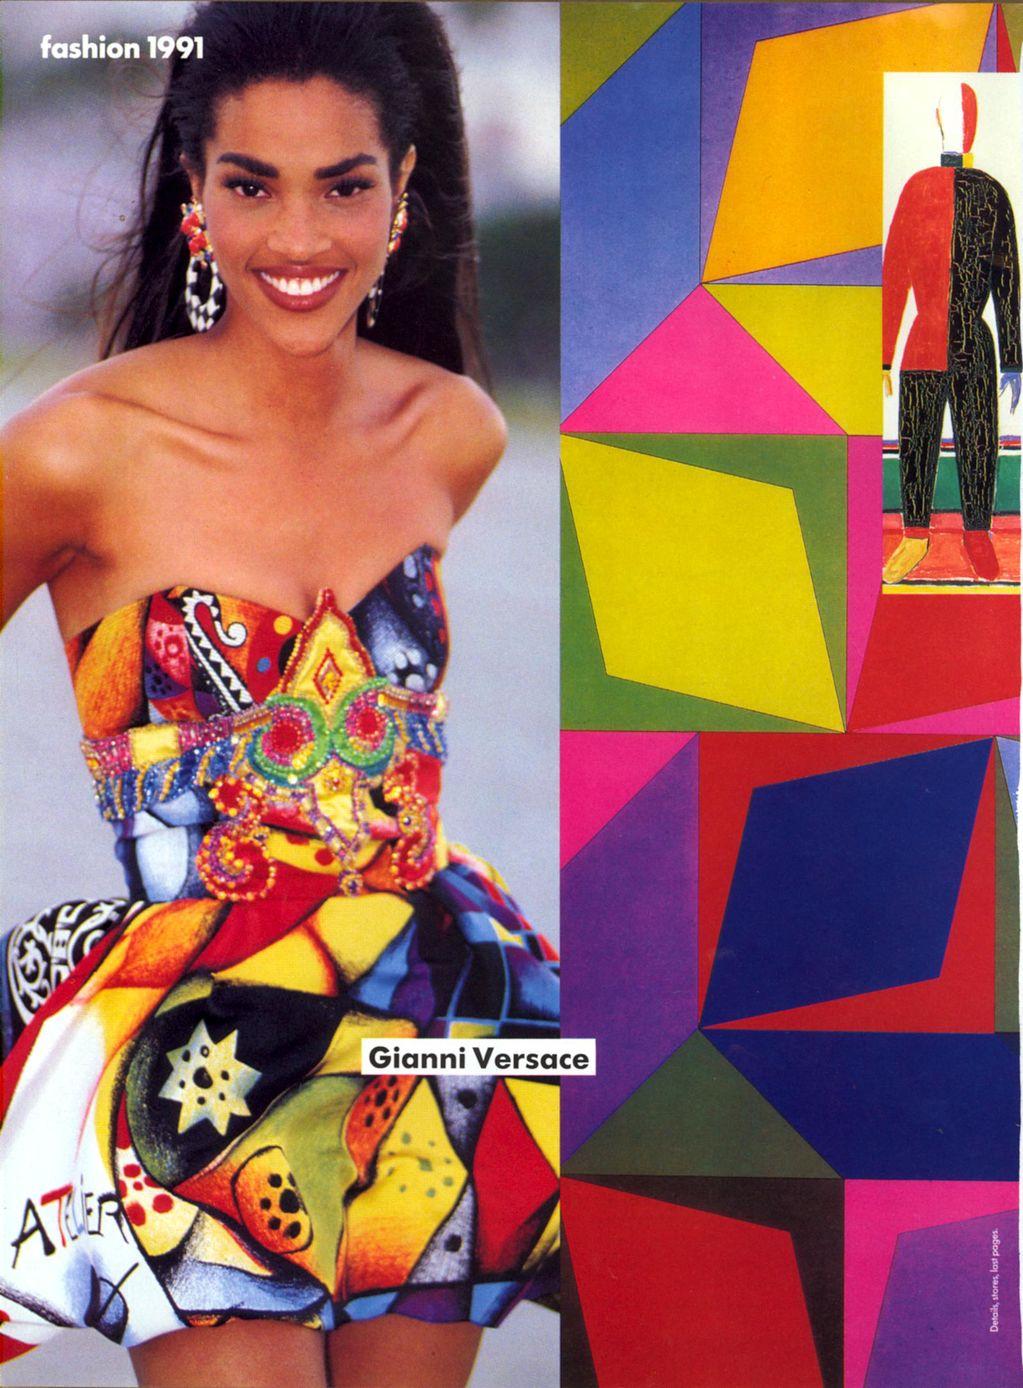 Vogue (US) January 1991 | Fashion 1991 07.jpg